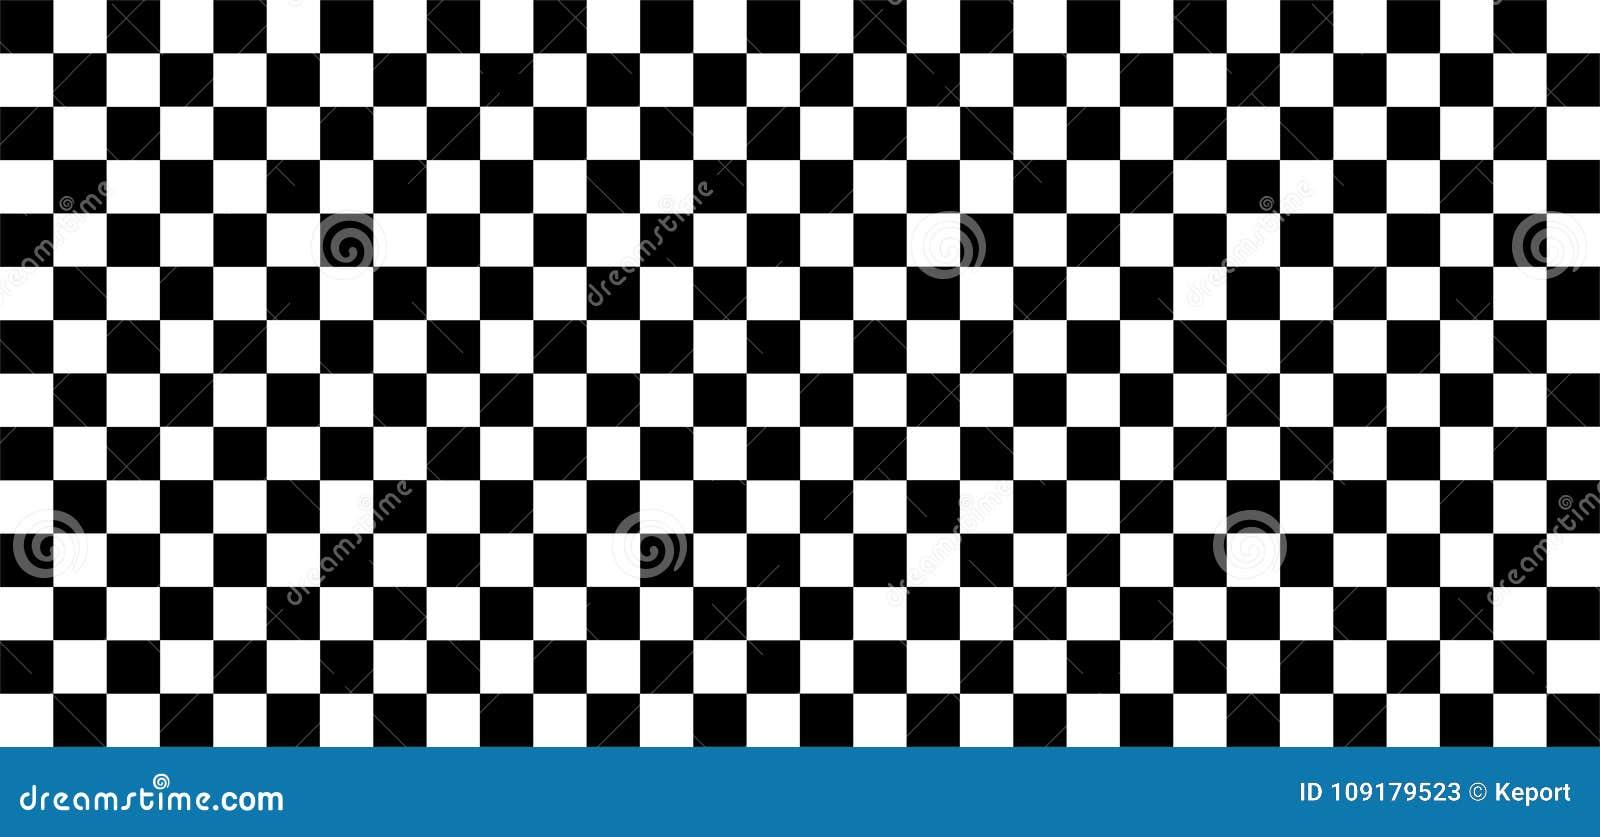 Seamless Checkered Black And White Background Stock Illustration